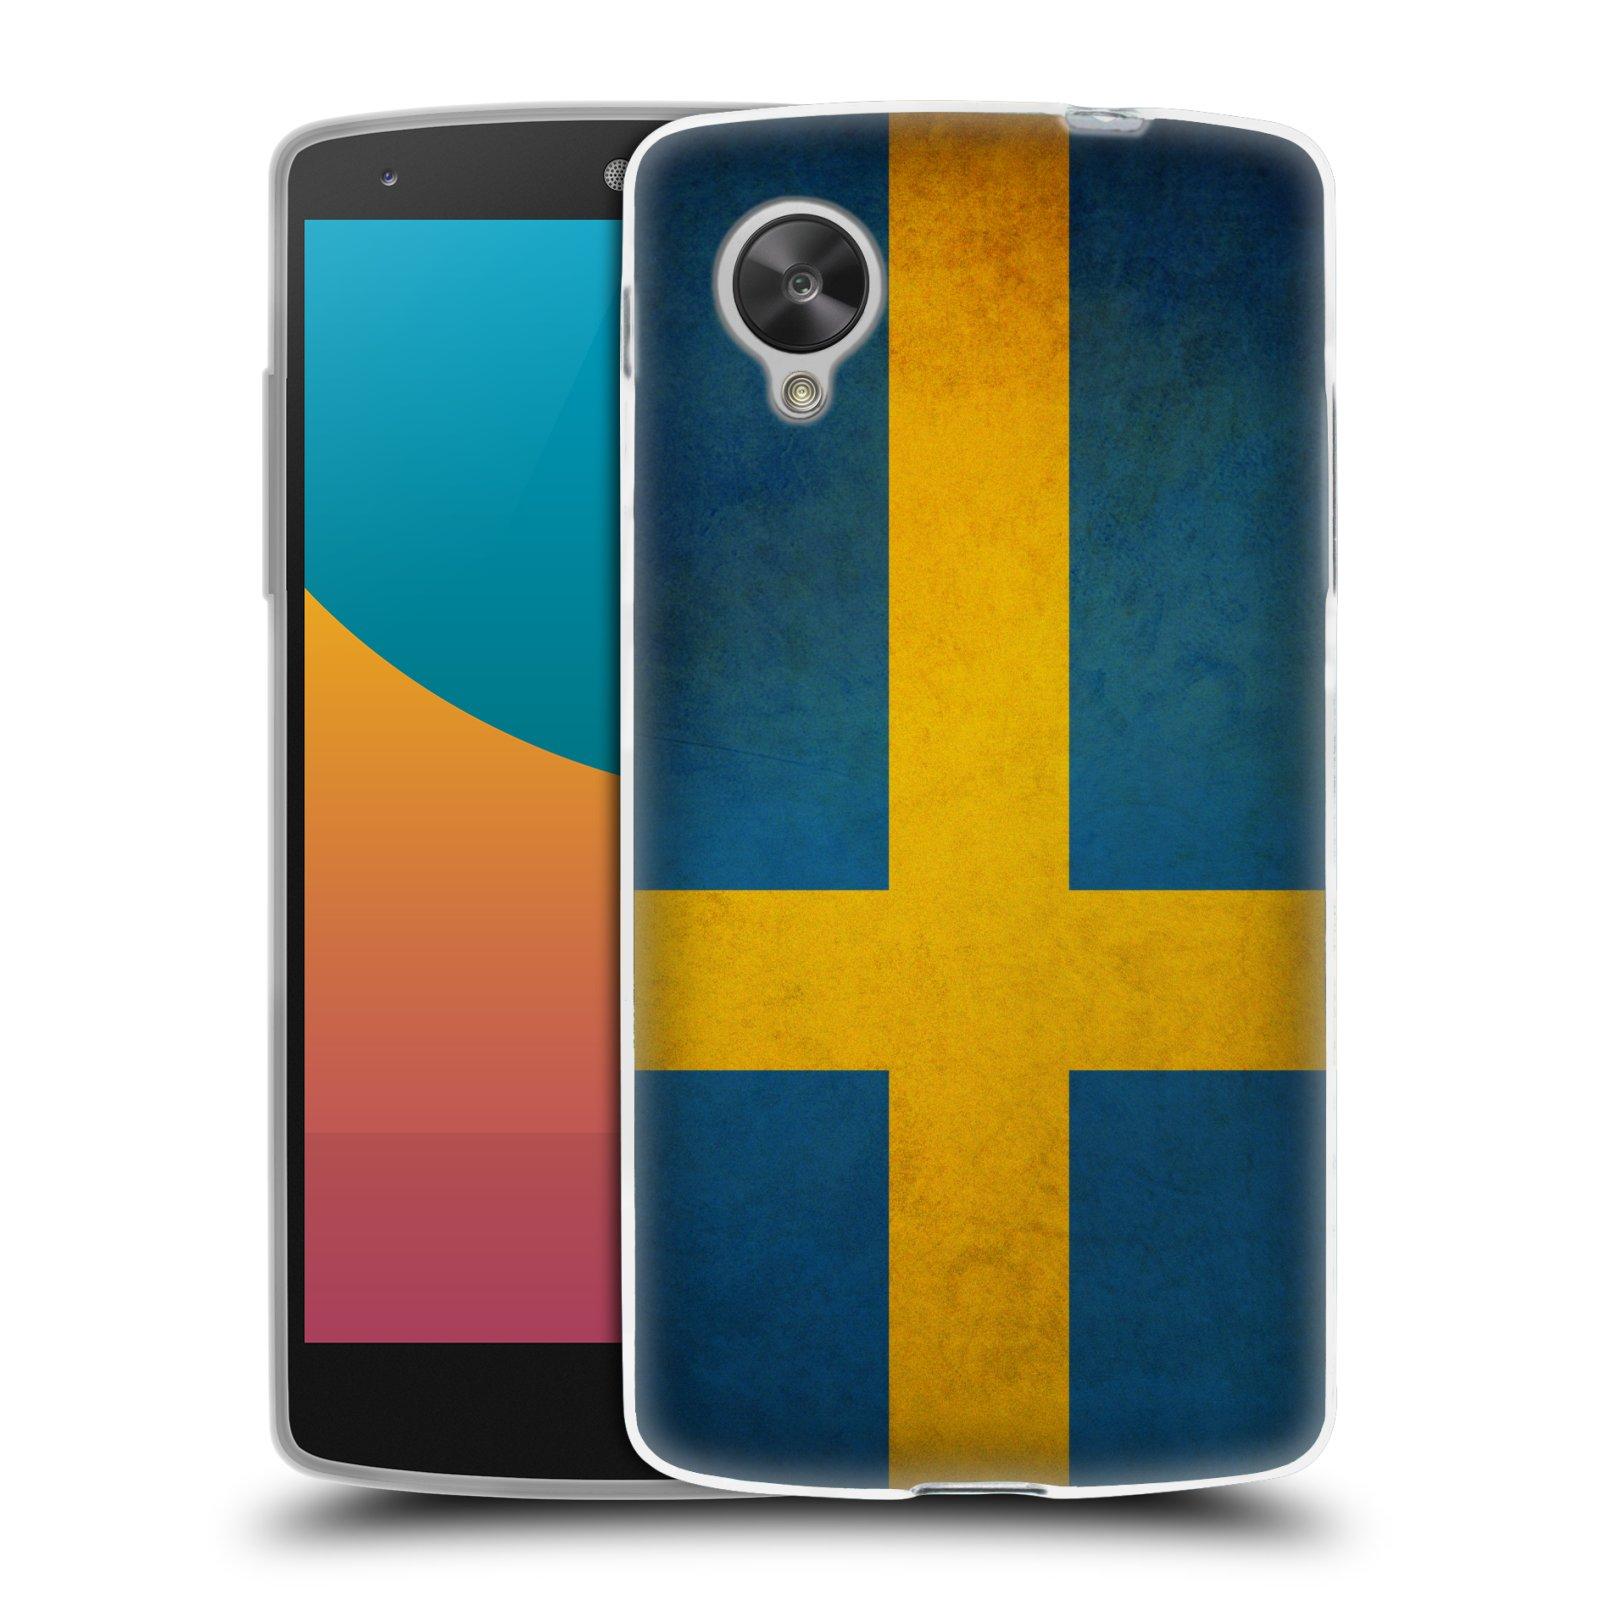 Silikonové pouzdro na mobil LG Nexus 5 HEAD CASE VLAJKA ŠVÉDSKO (Silikonový kryt či obal na mobilní telefon LG Google Nexus 5 D821)